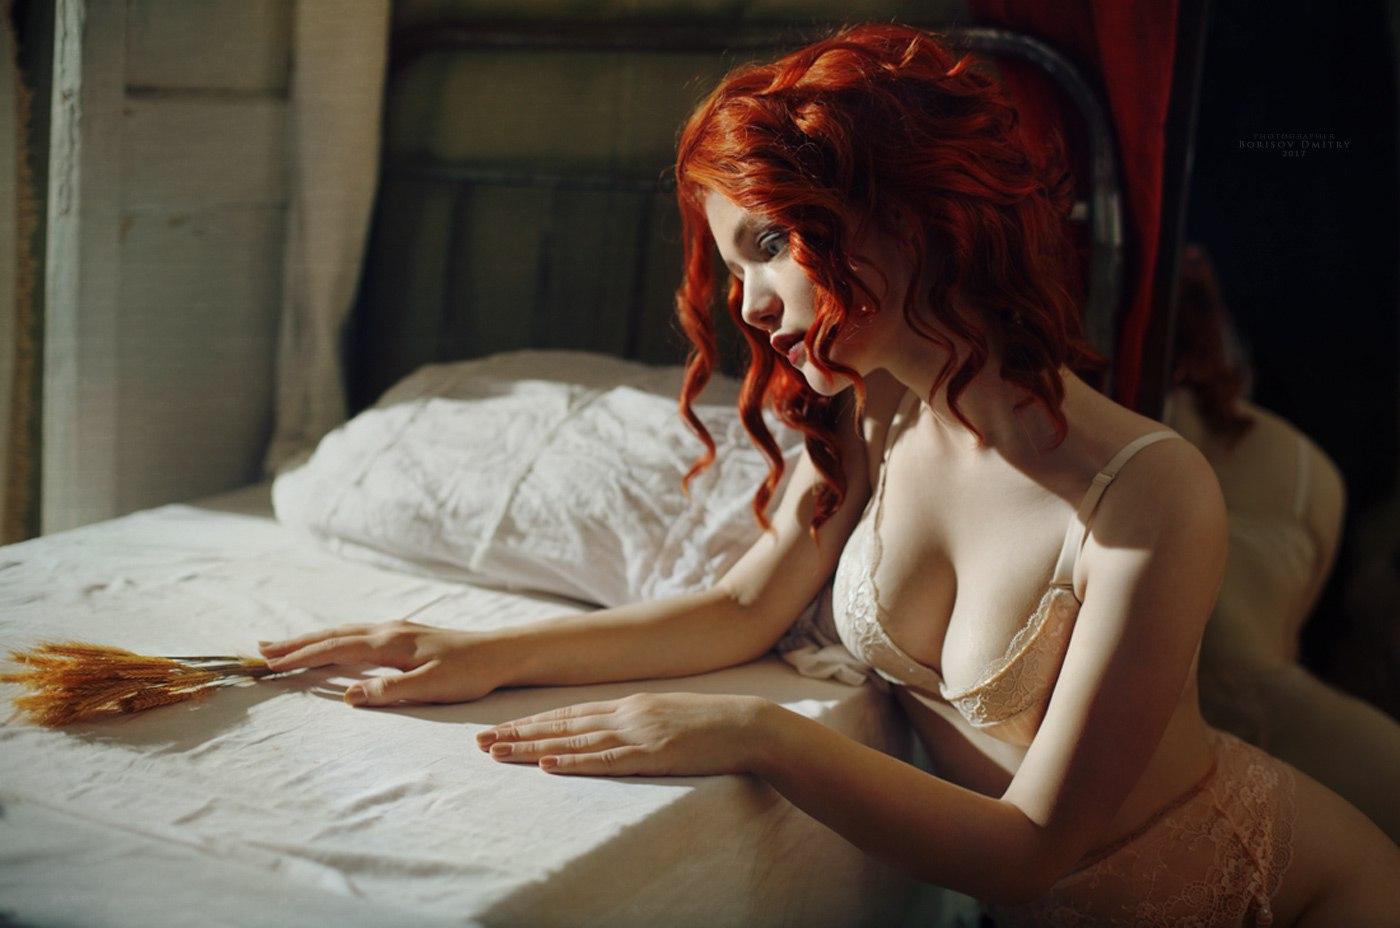 Азиатки домашнее порно фото